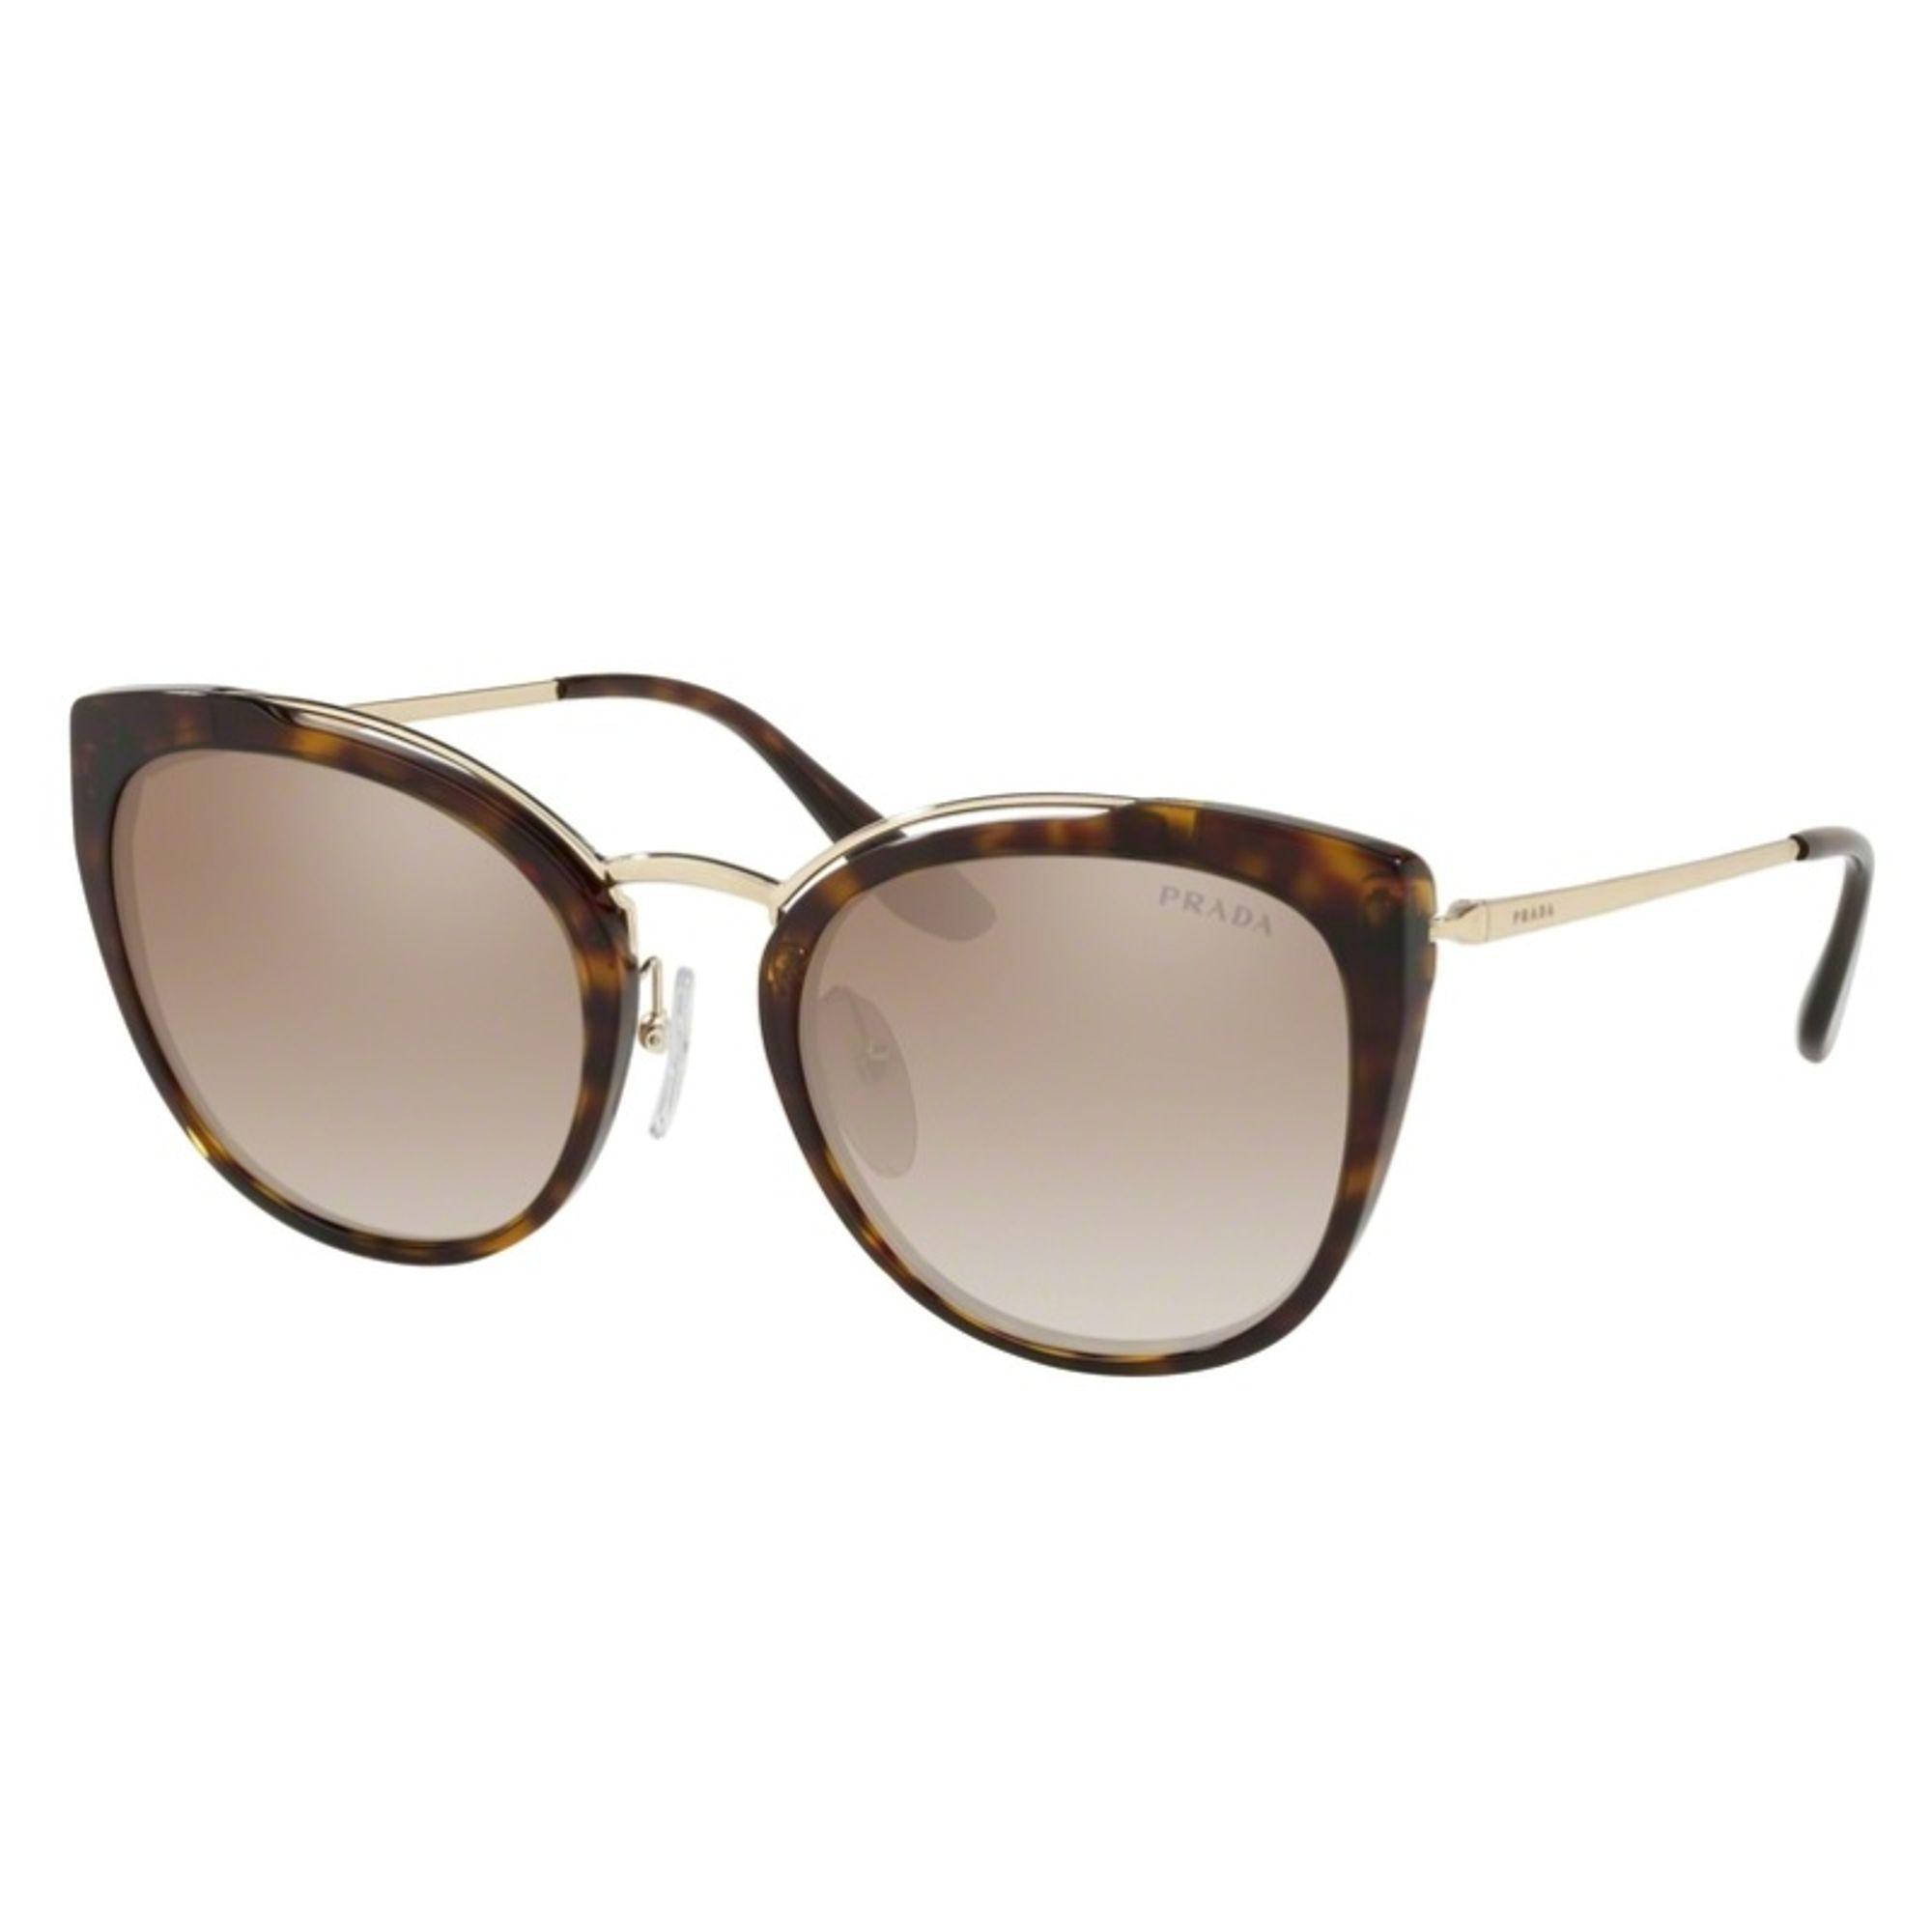 Prada - PR20US 2AU4P0 - Óculos de sol